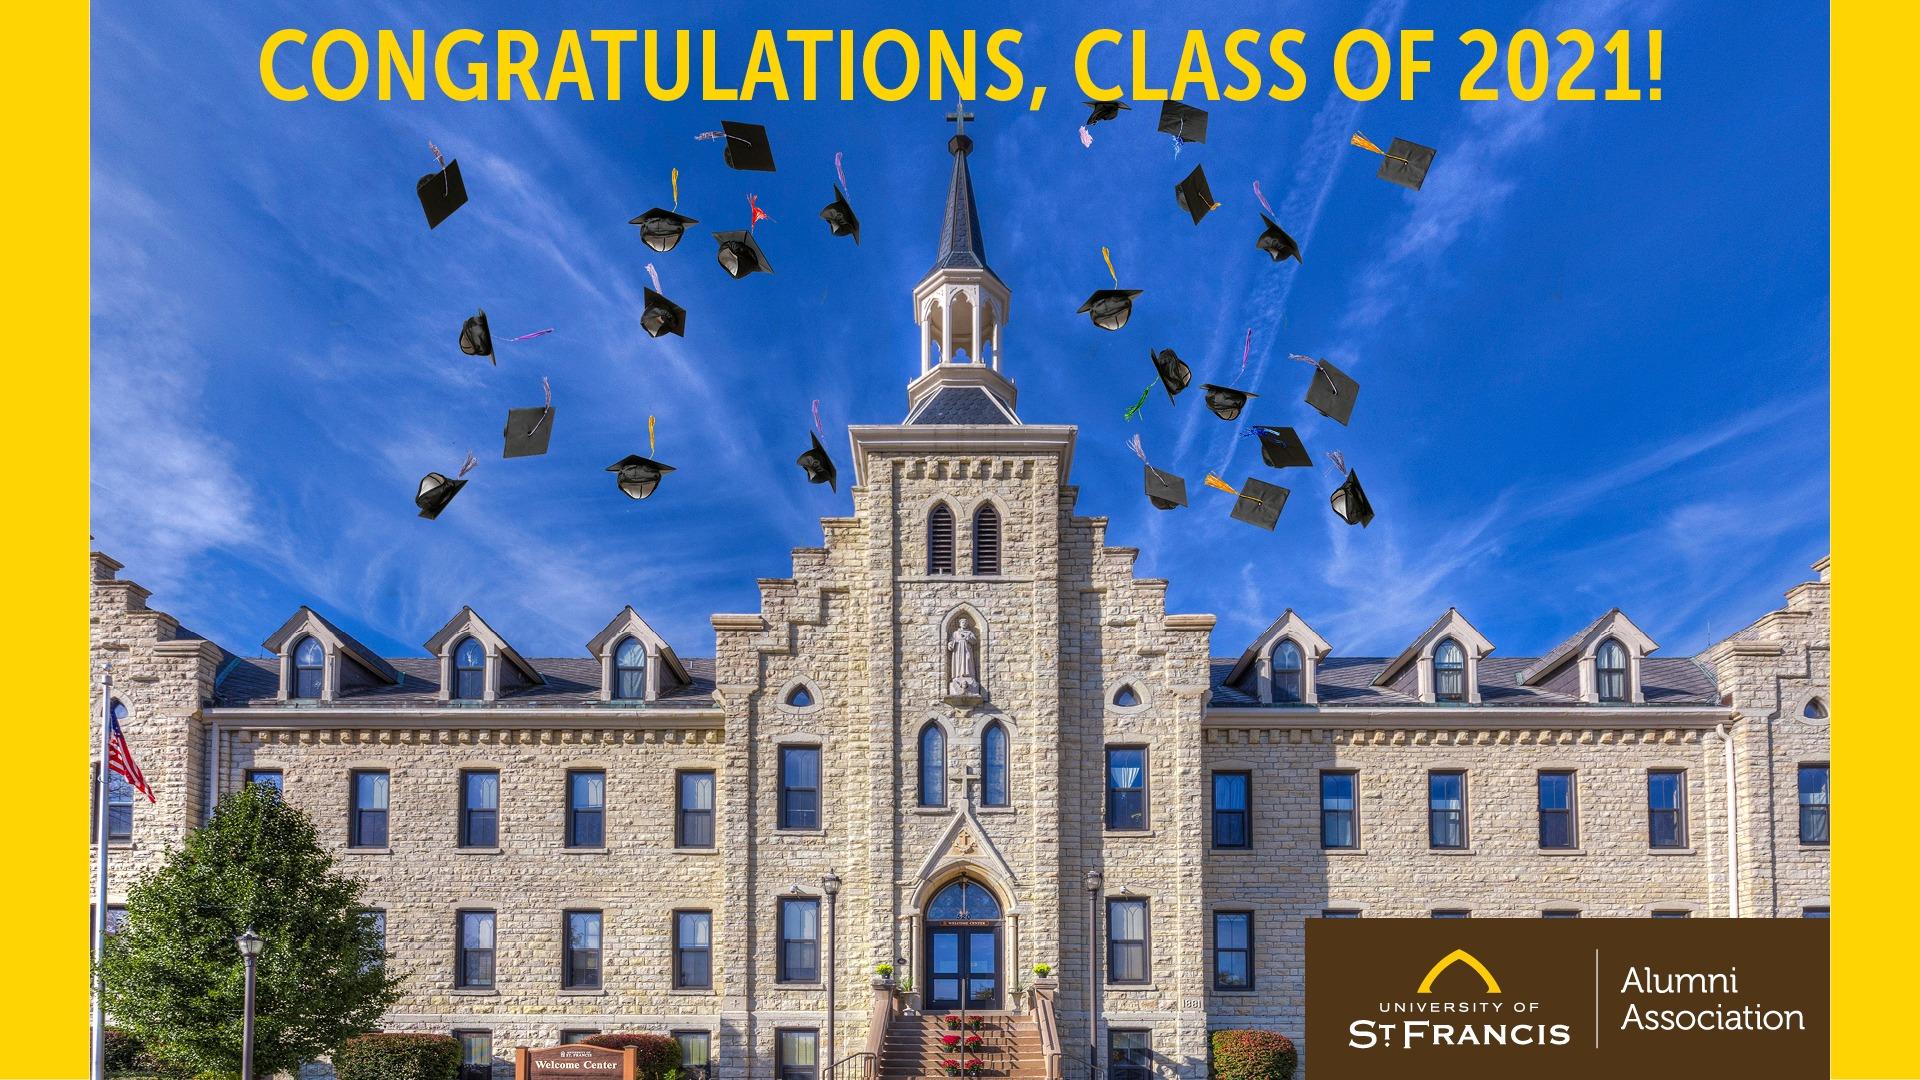 class of 2021 alumni background